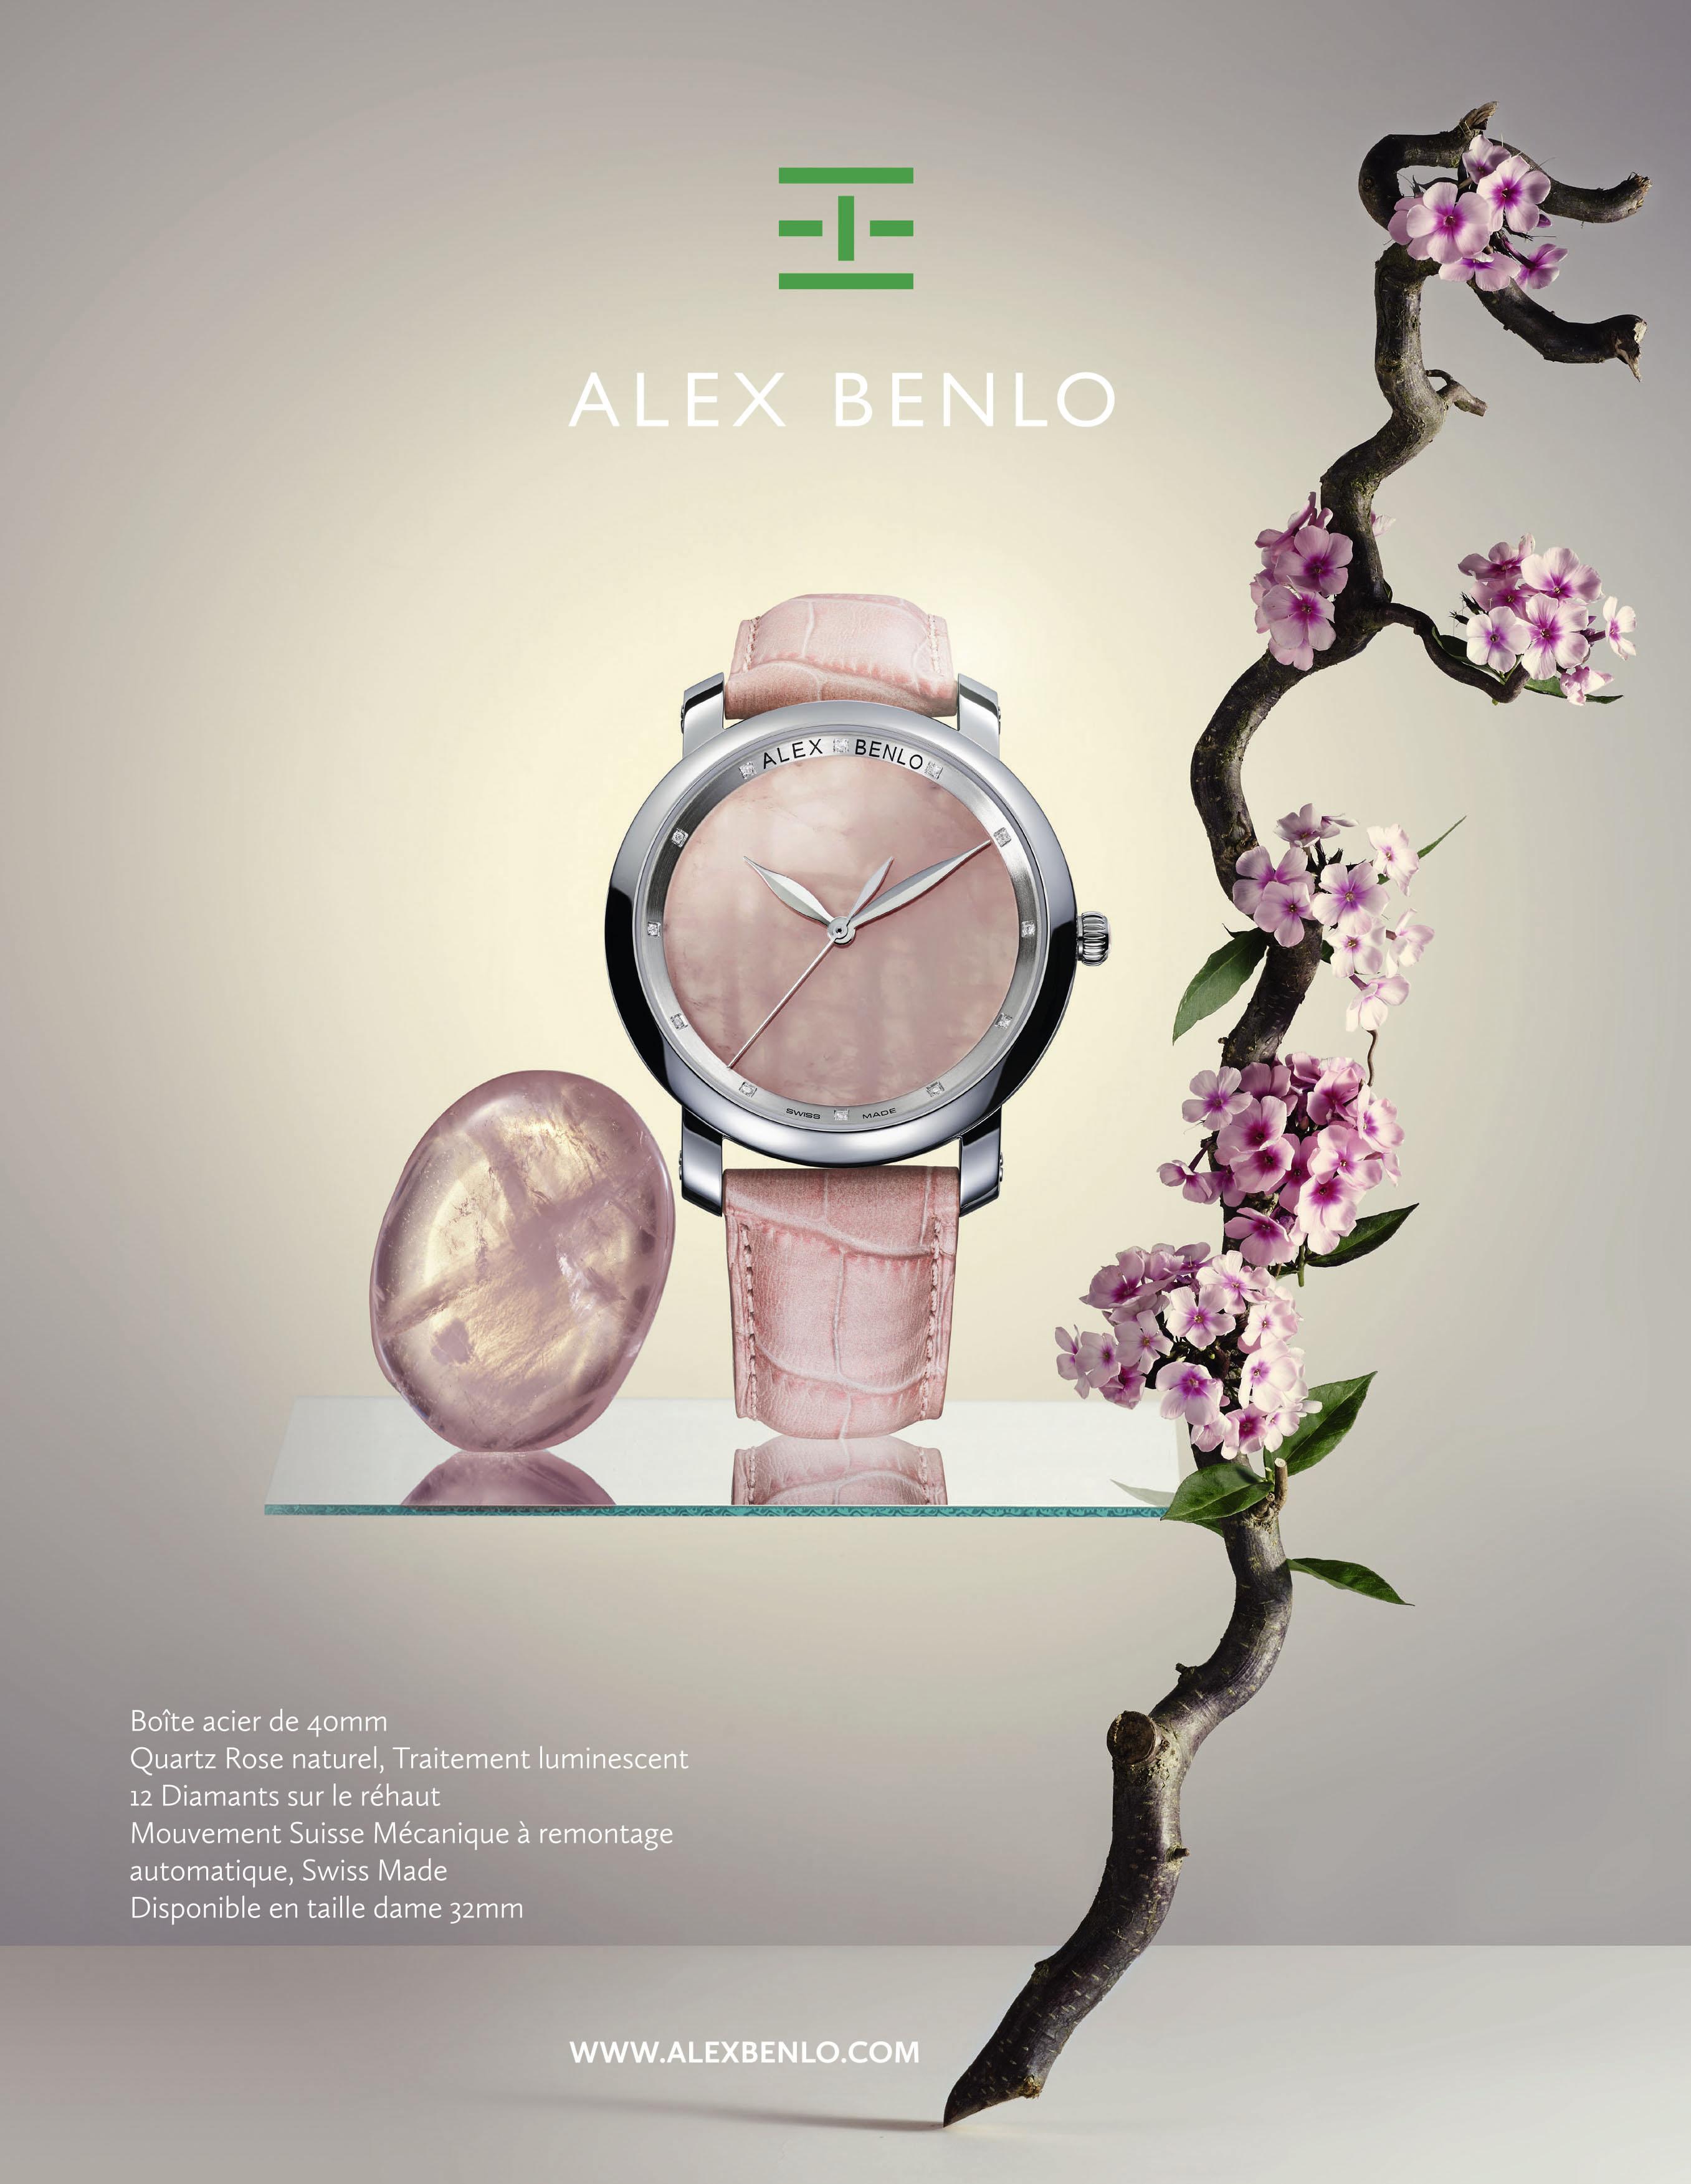 ALEX BENLO